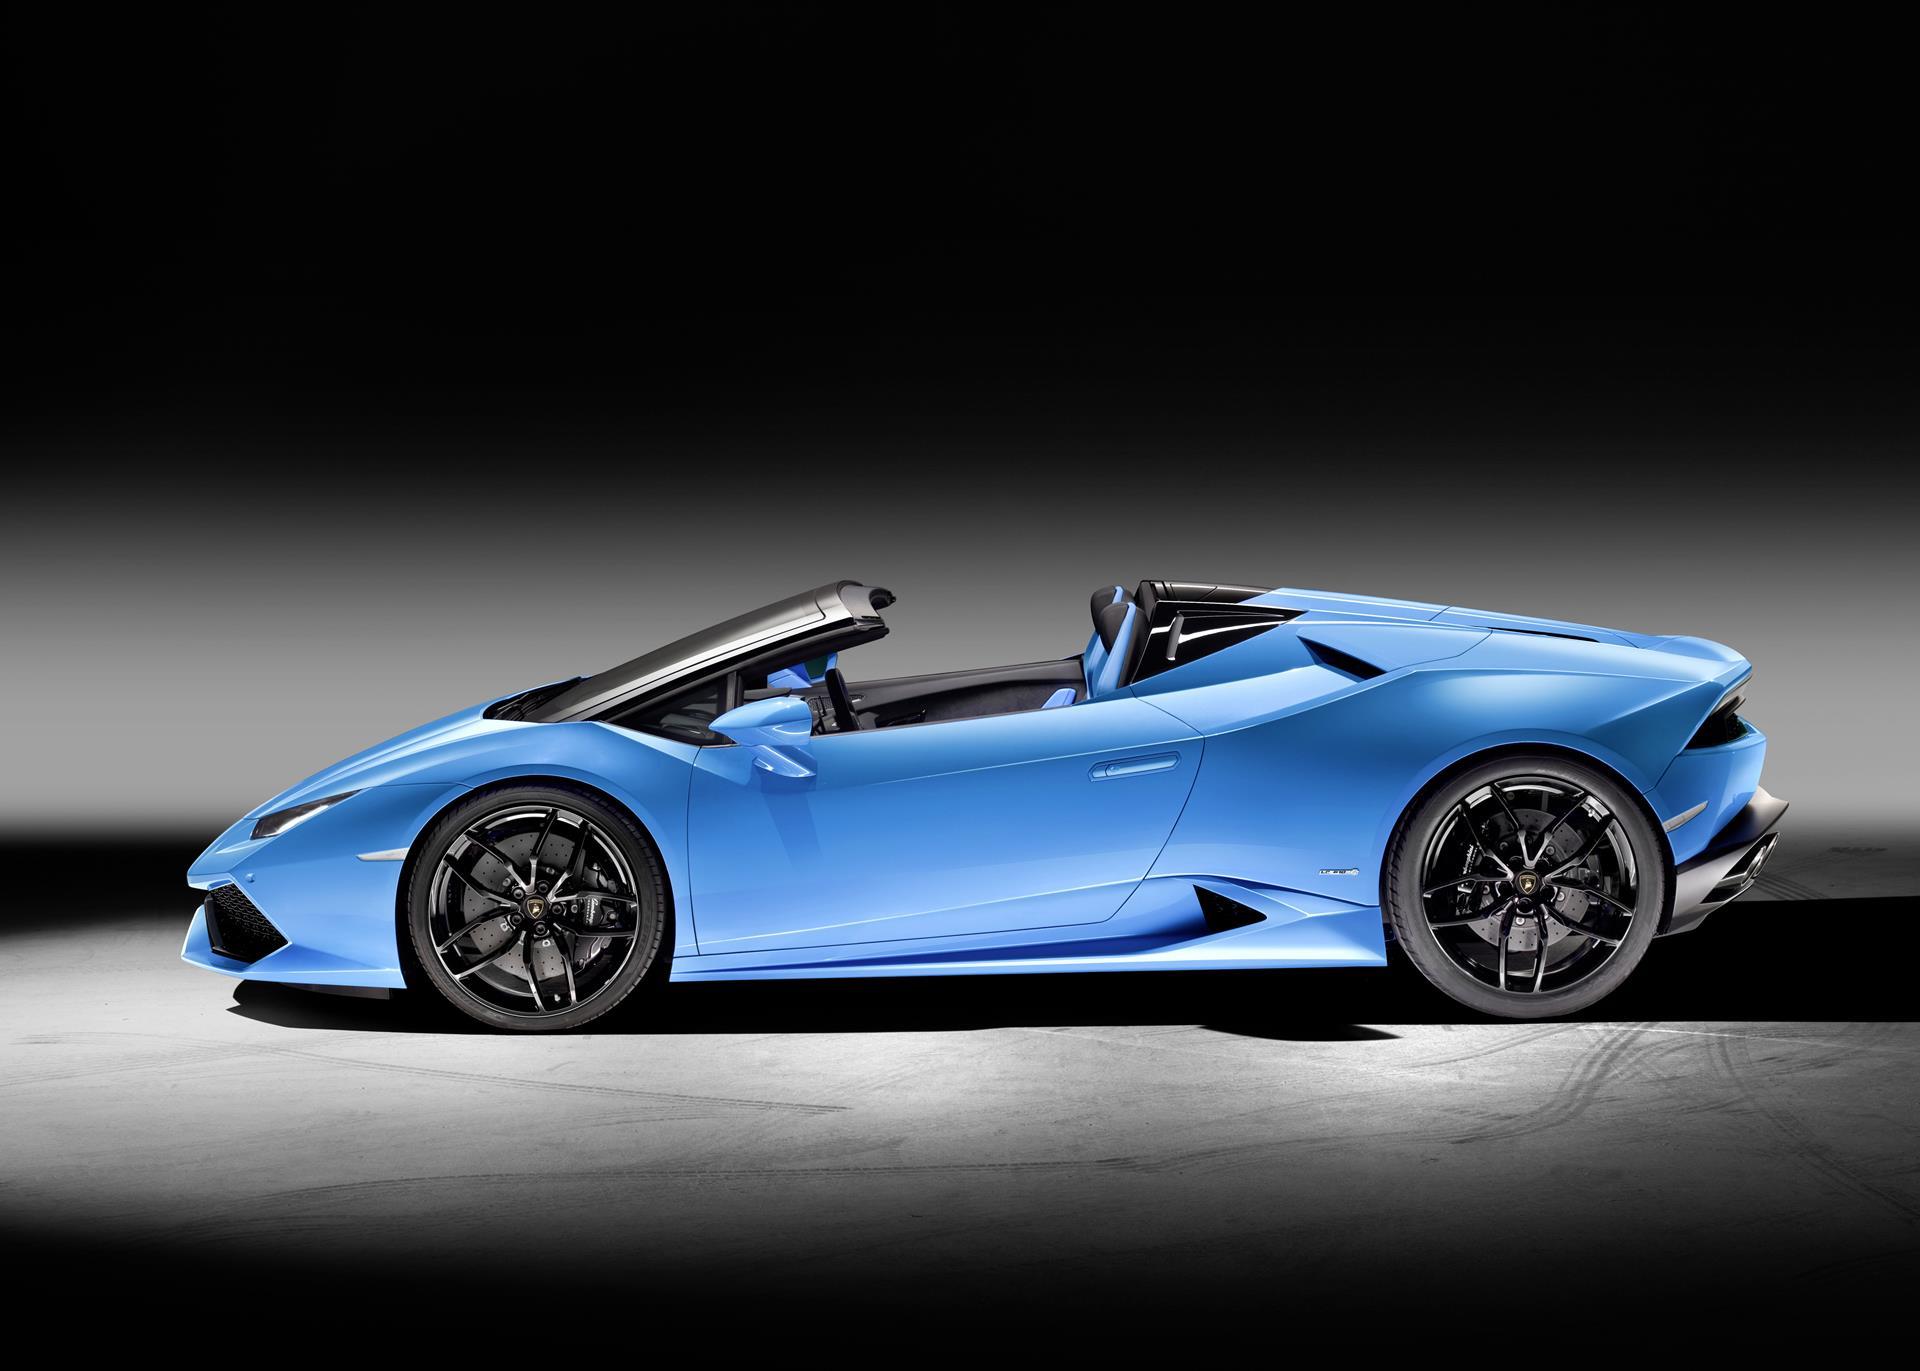 2015-Lamborghini-Huracan-LP-610-4-Spyder-01 Amazing 2015 Lamborghini Huracan Price Per Month Cars Trend